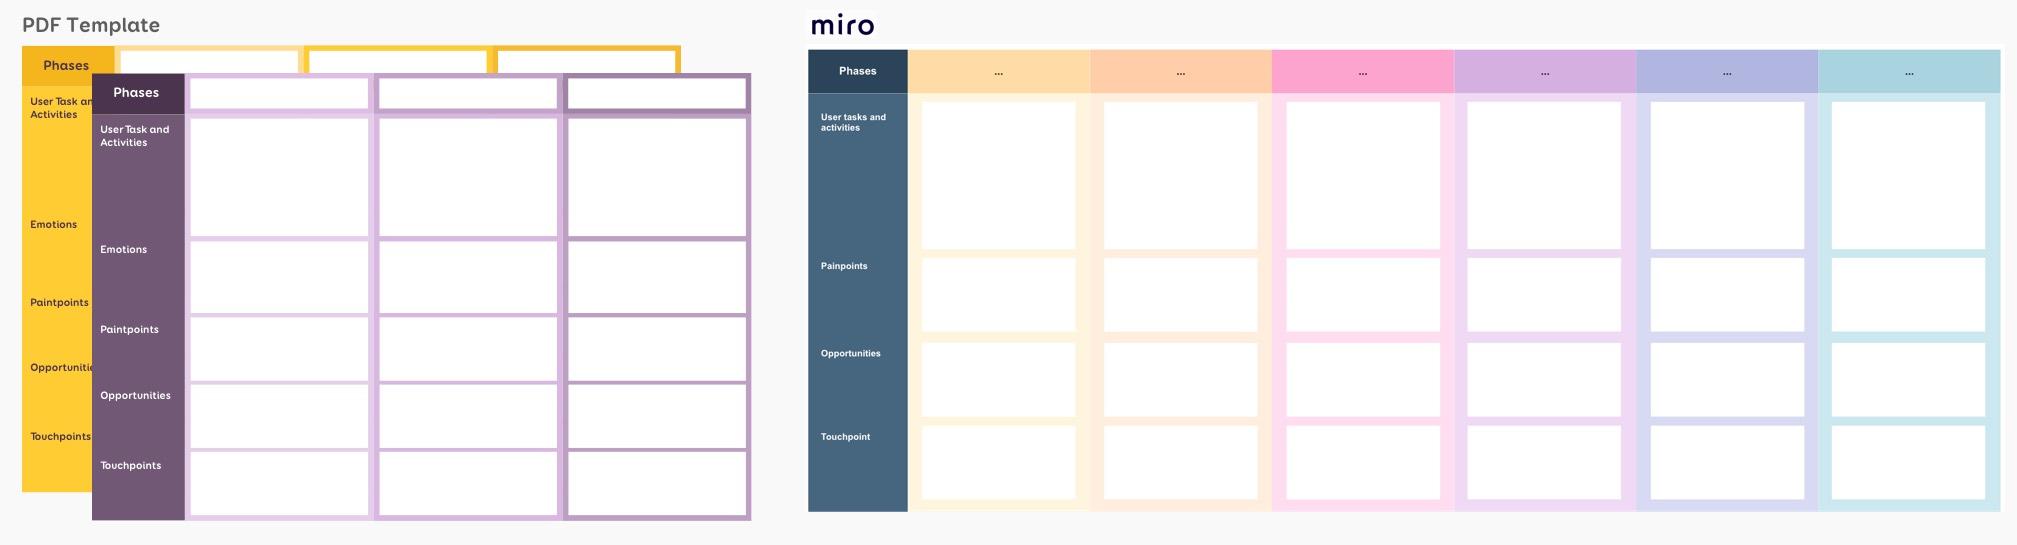 Miro and PDF templates